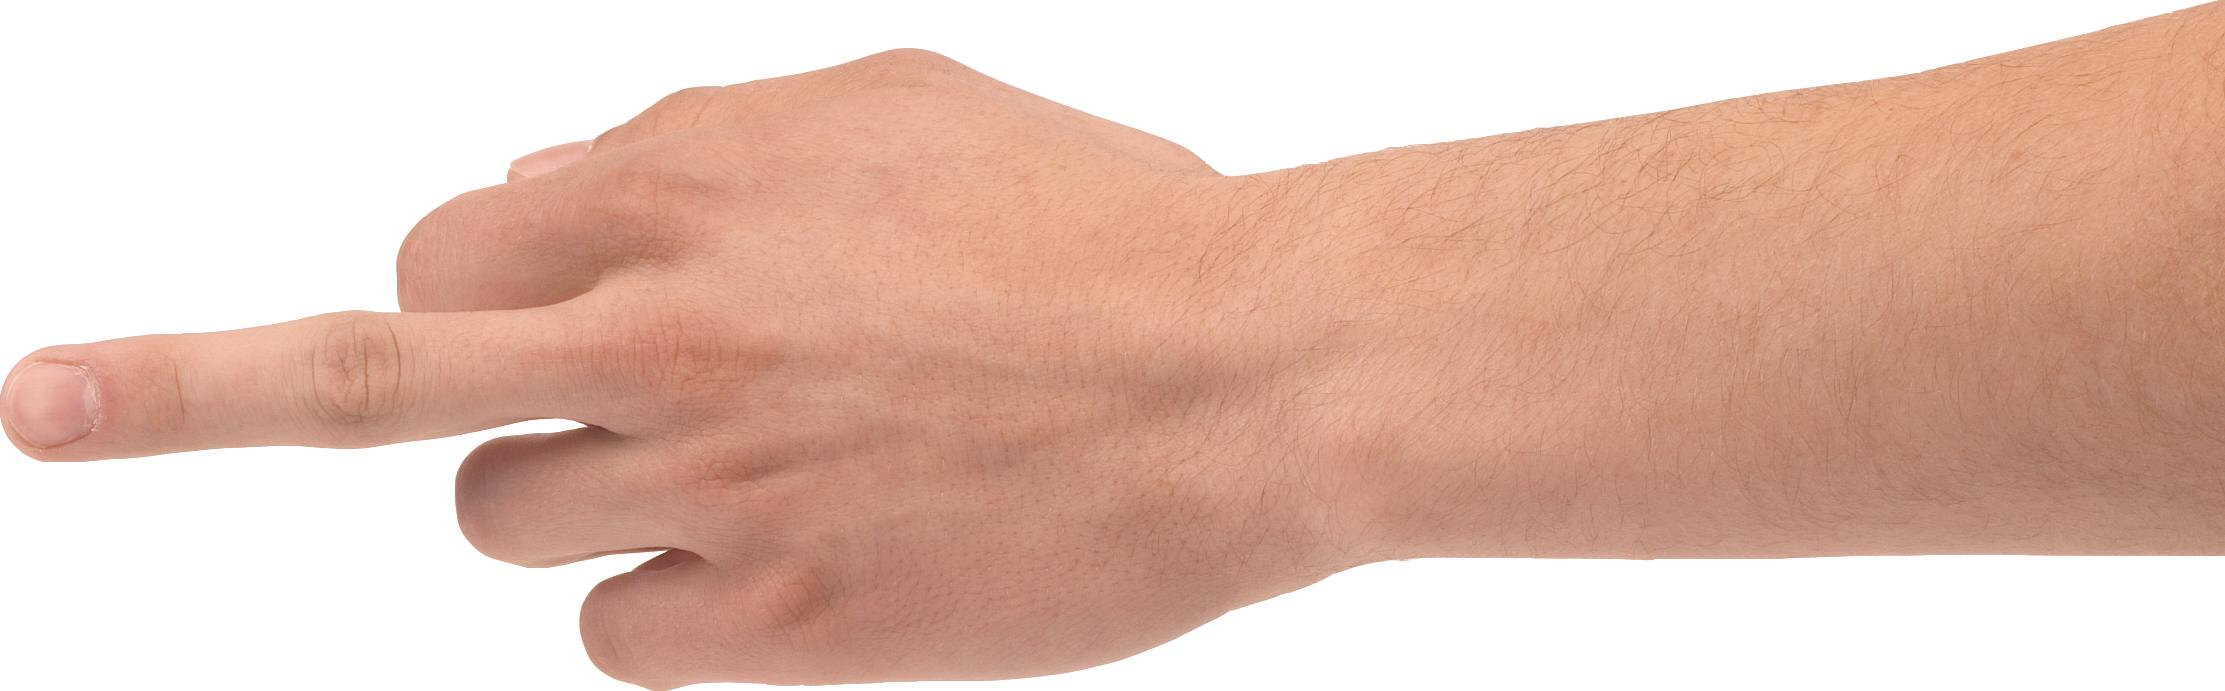 Hand png image transparent 6